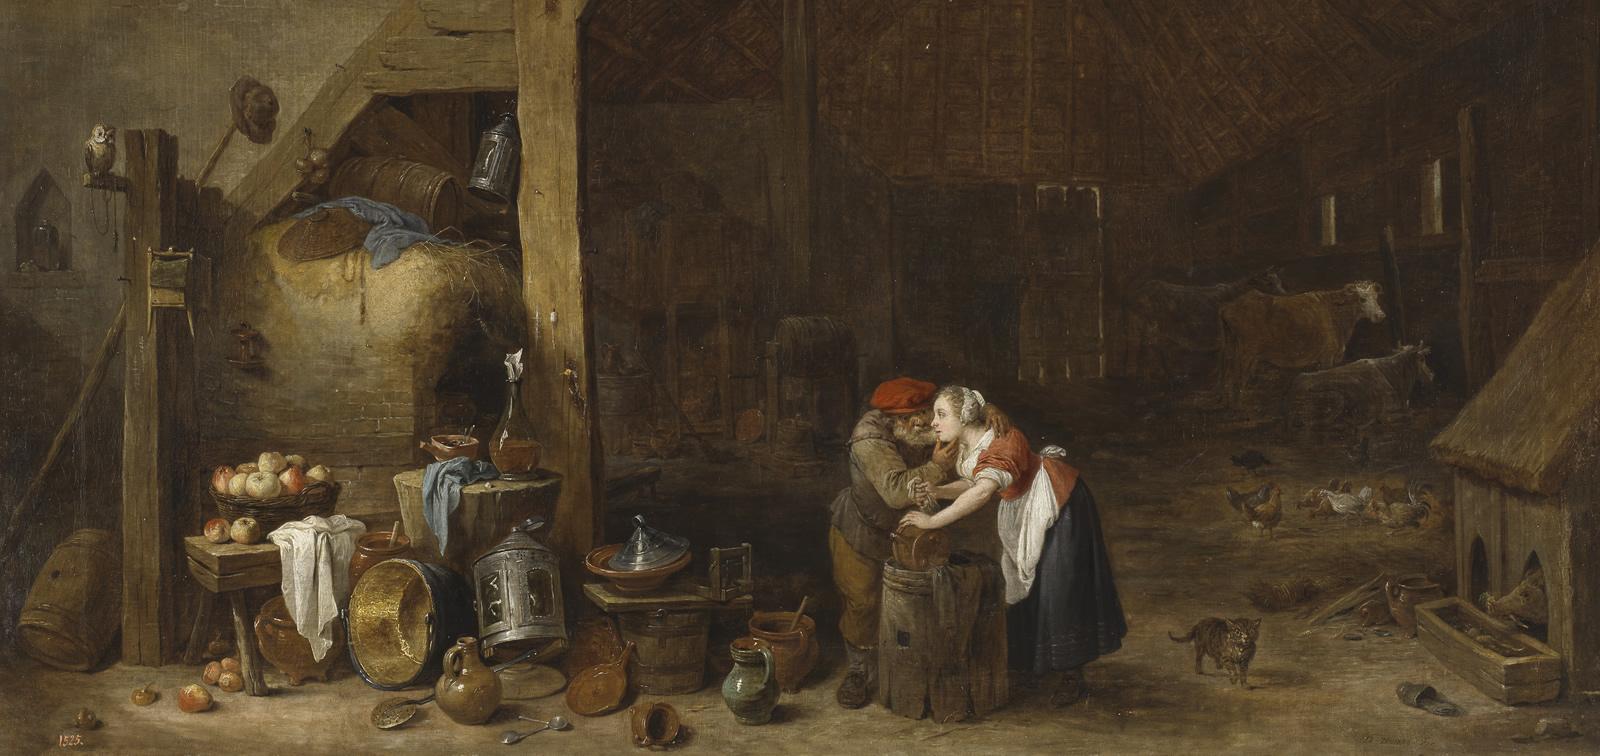 Captive Beauty. Small Treasures at the Prado Museum